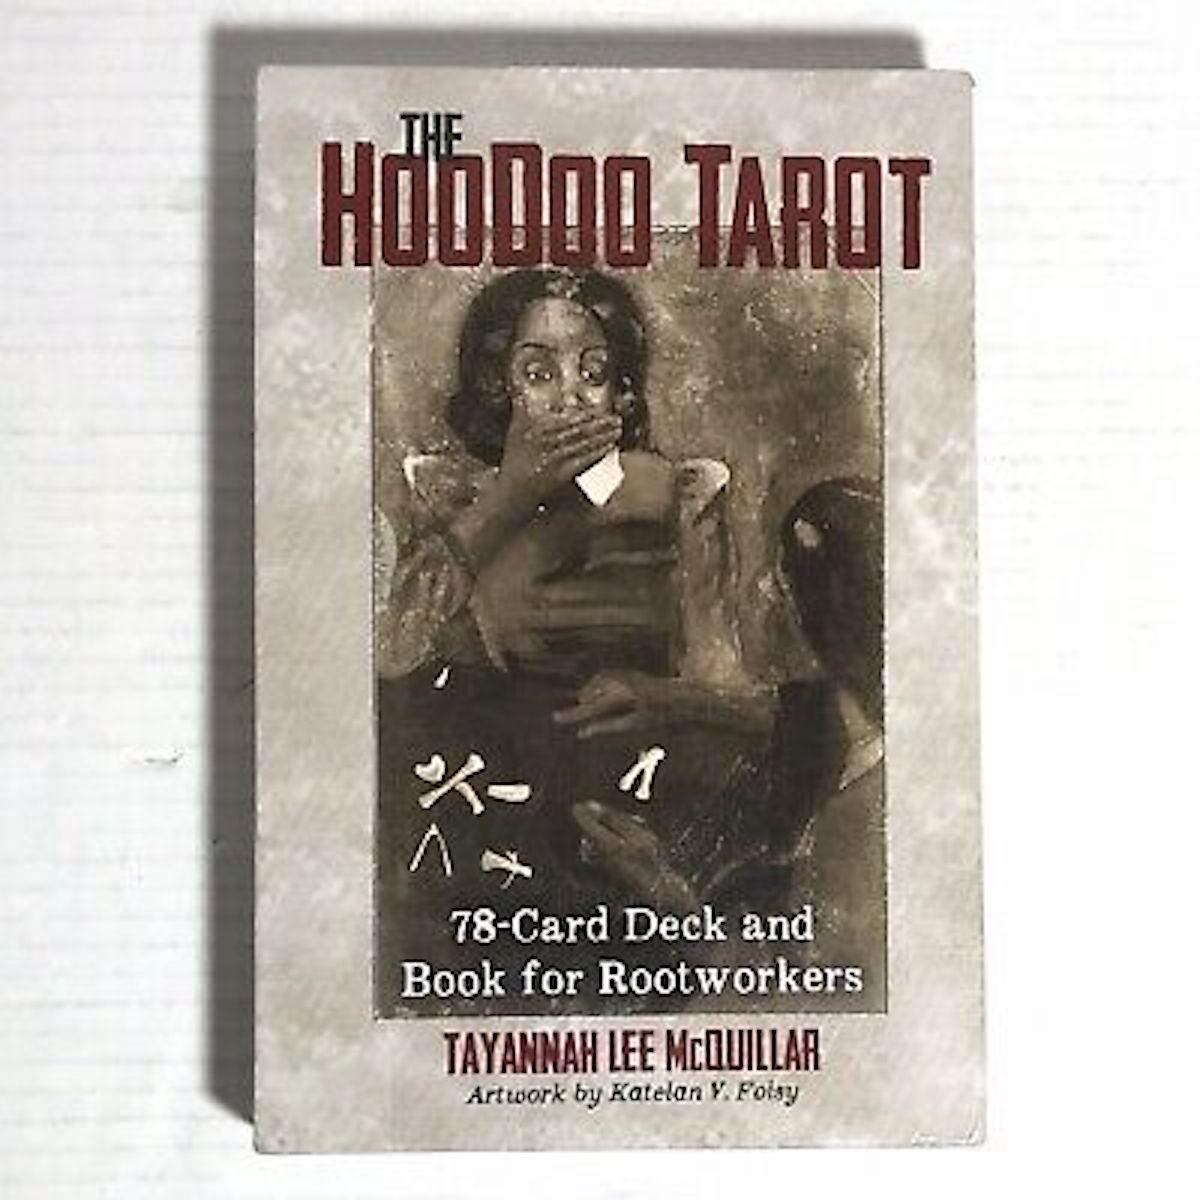 Episode 80: The Hoodoo Tarot With Tayannah Lee McQuillar